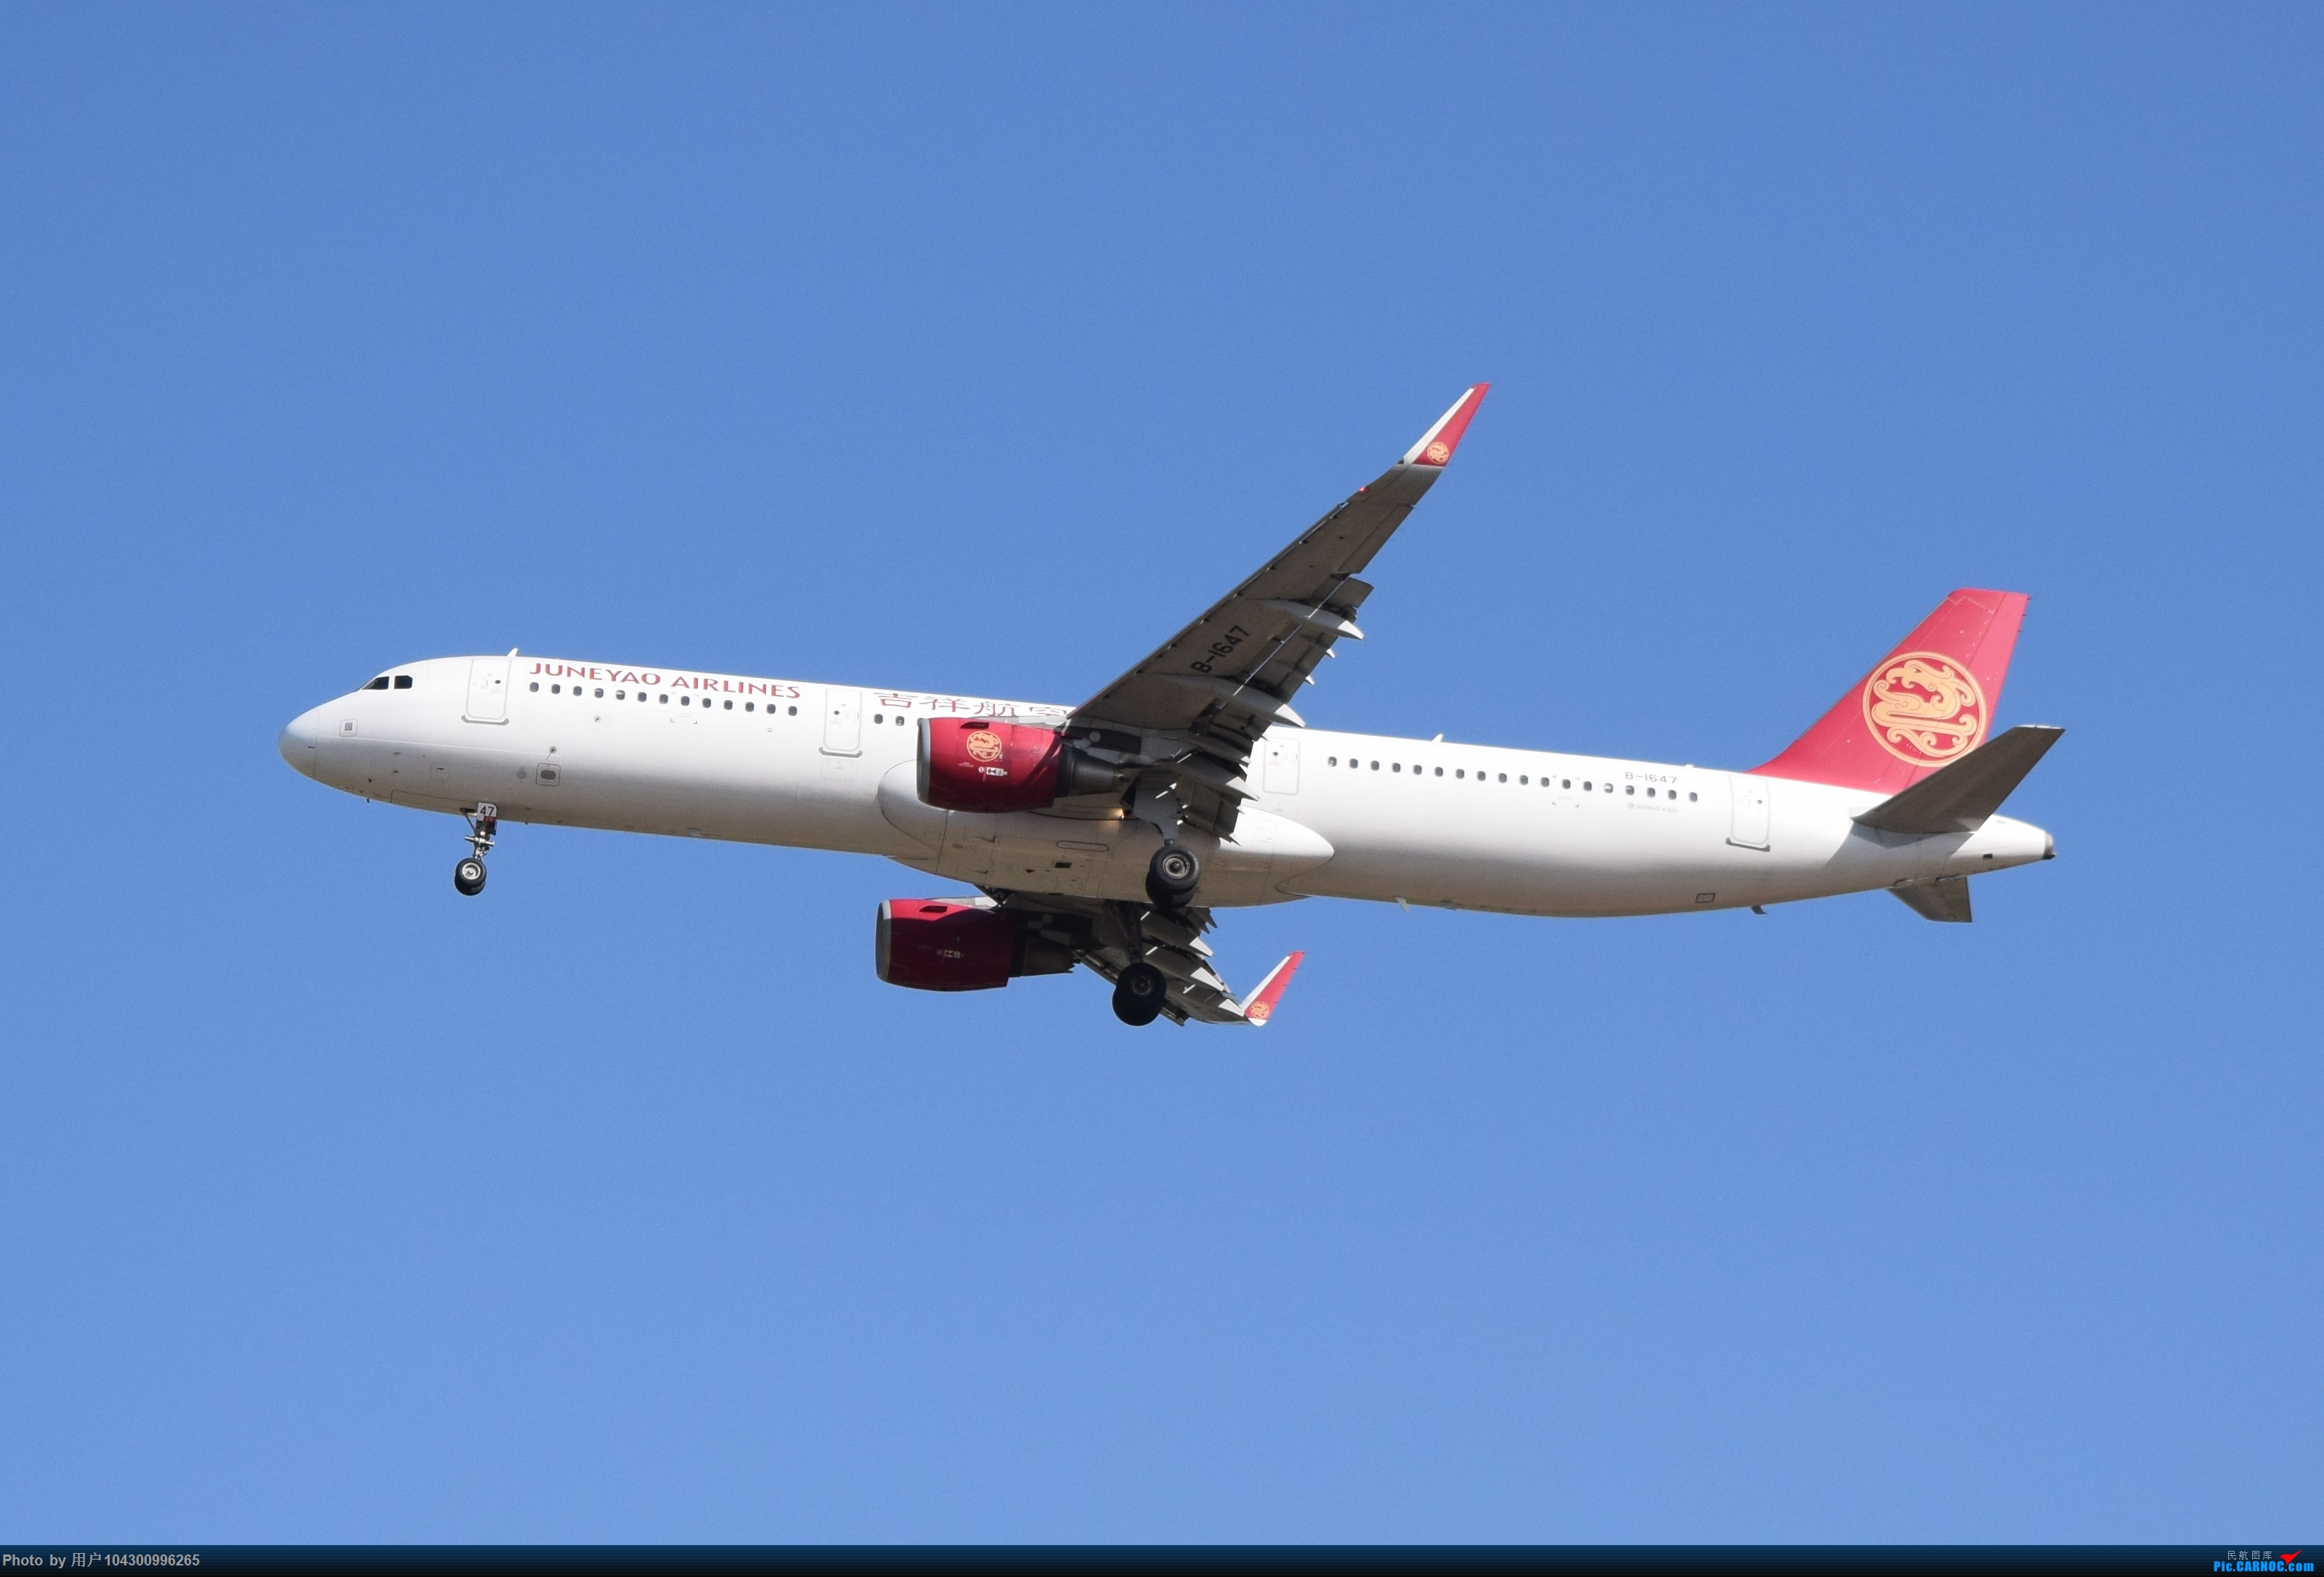 Re:[原创][KWE]贵阳今天天气不错,随便拍几张! AIRBUS A321-200 B-1647 中国贵阳龙洞堡国际机场